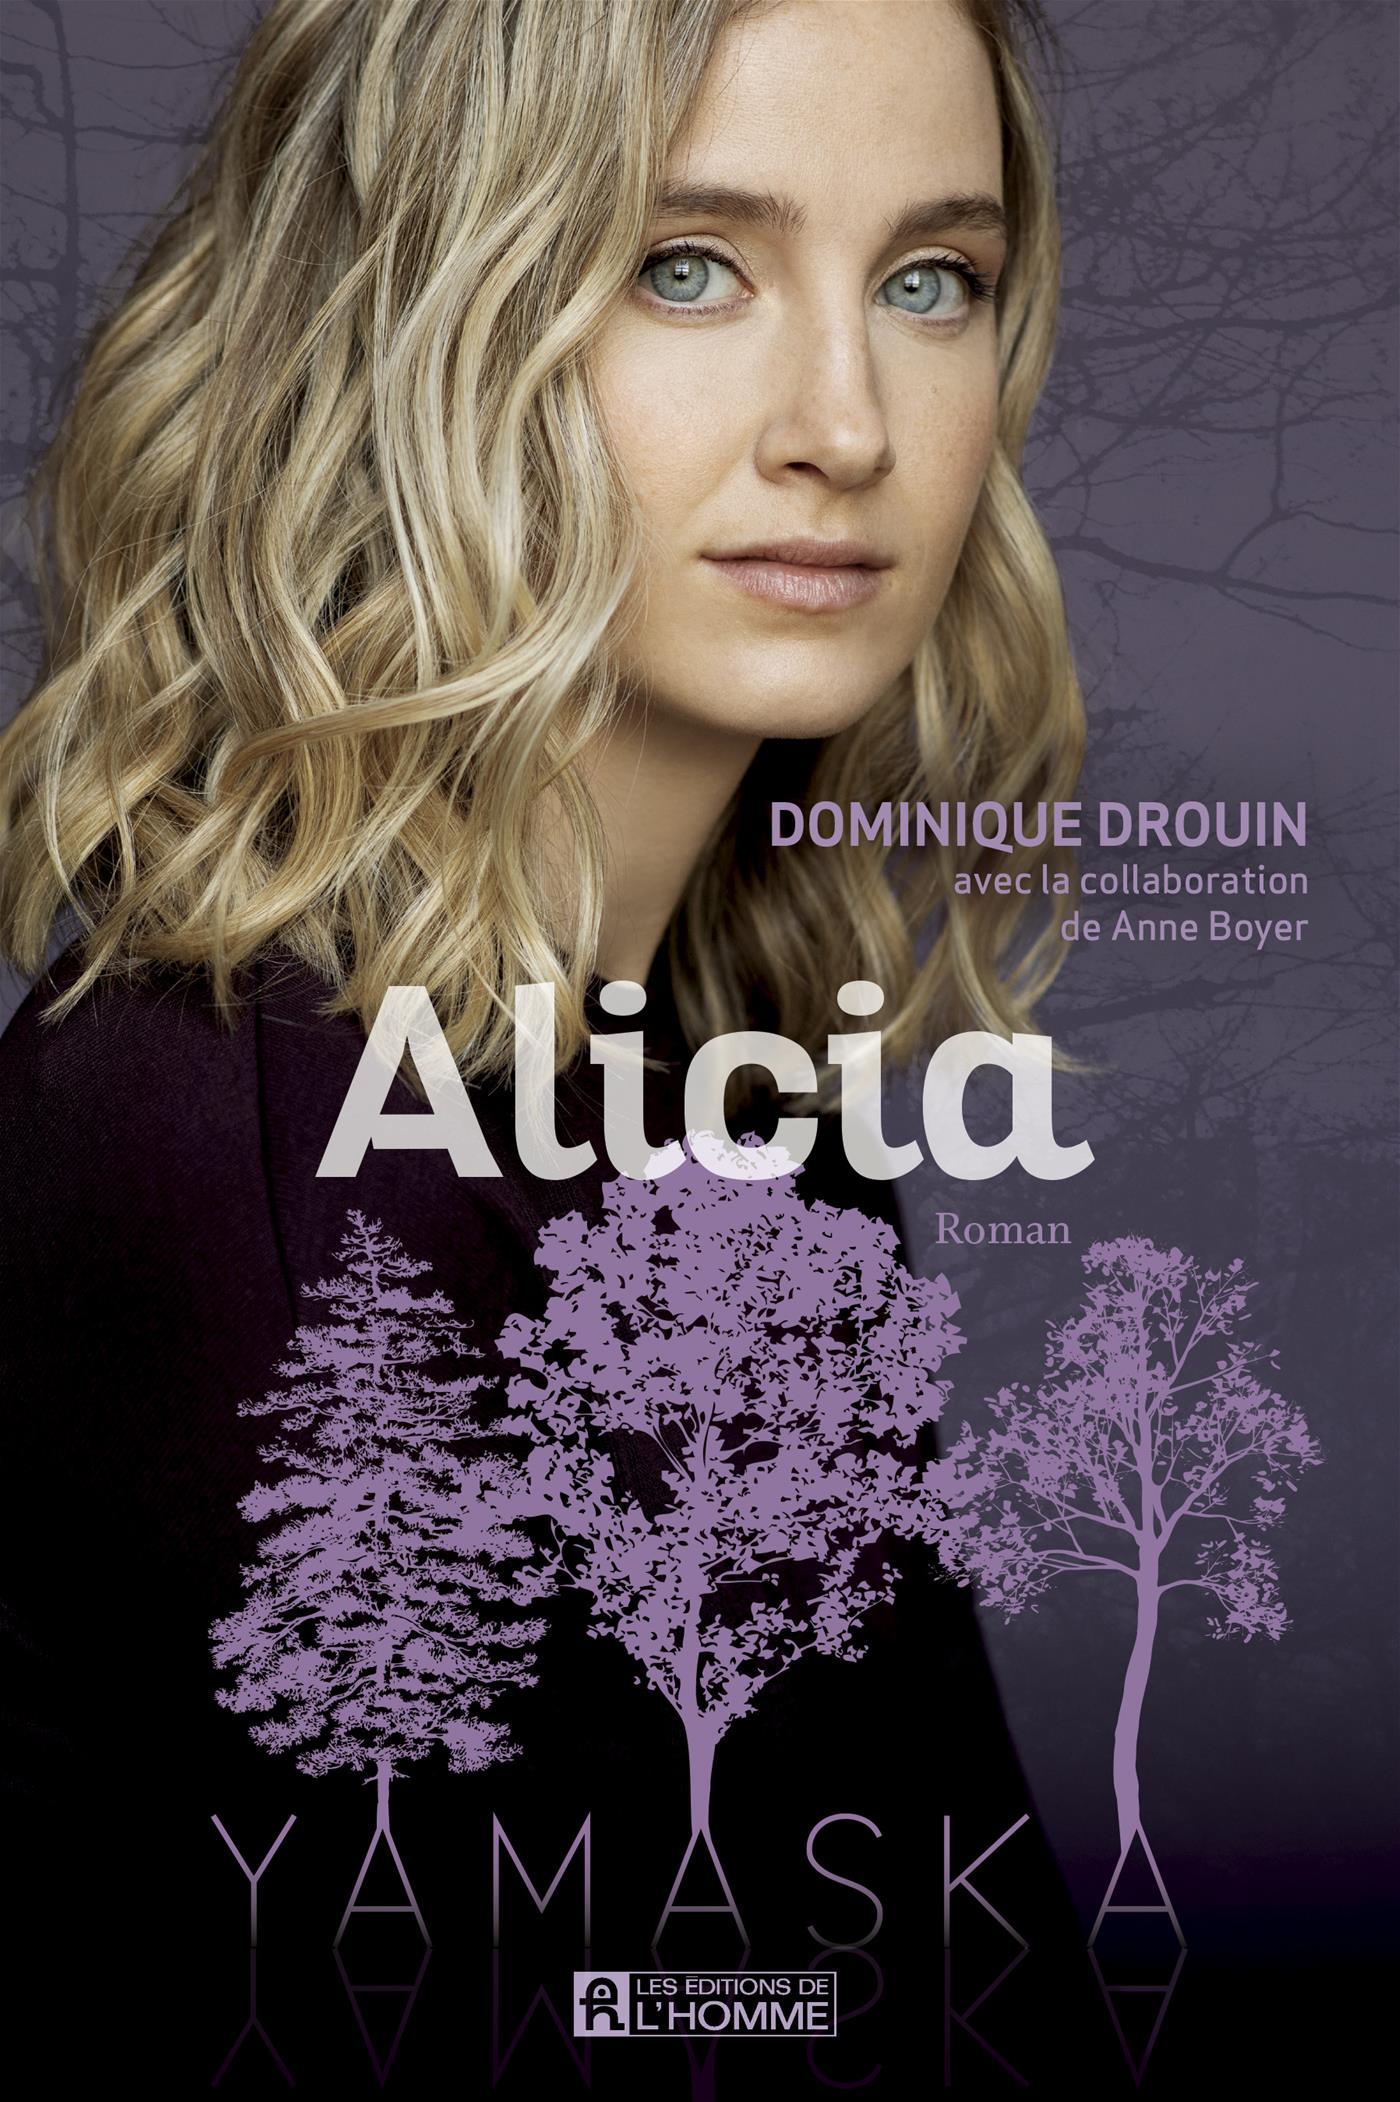 Cover Image of Alicia - Yamaska